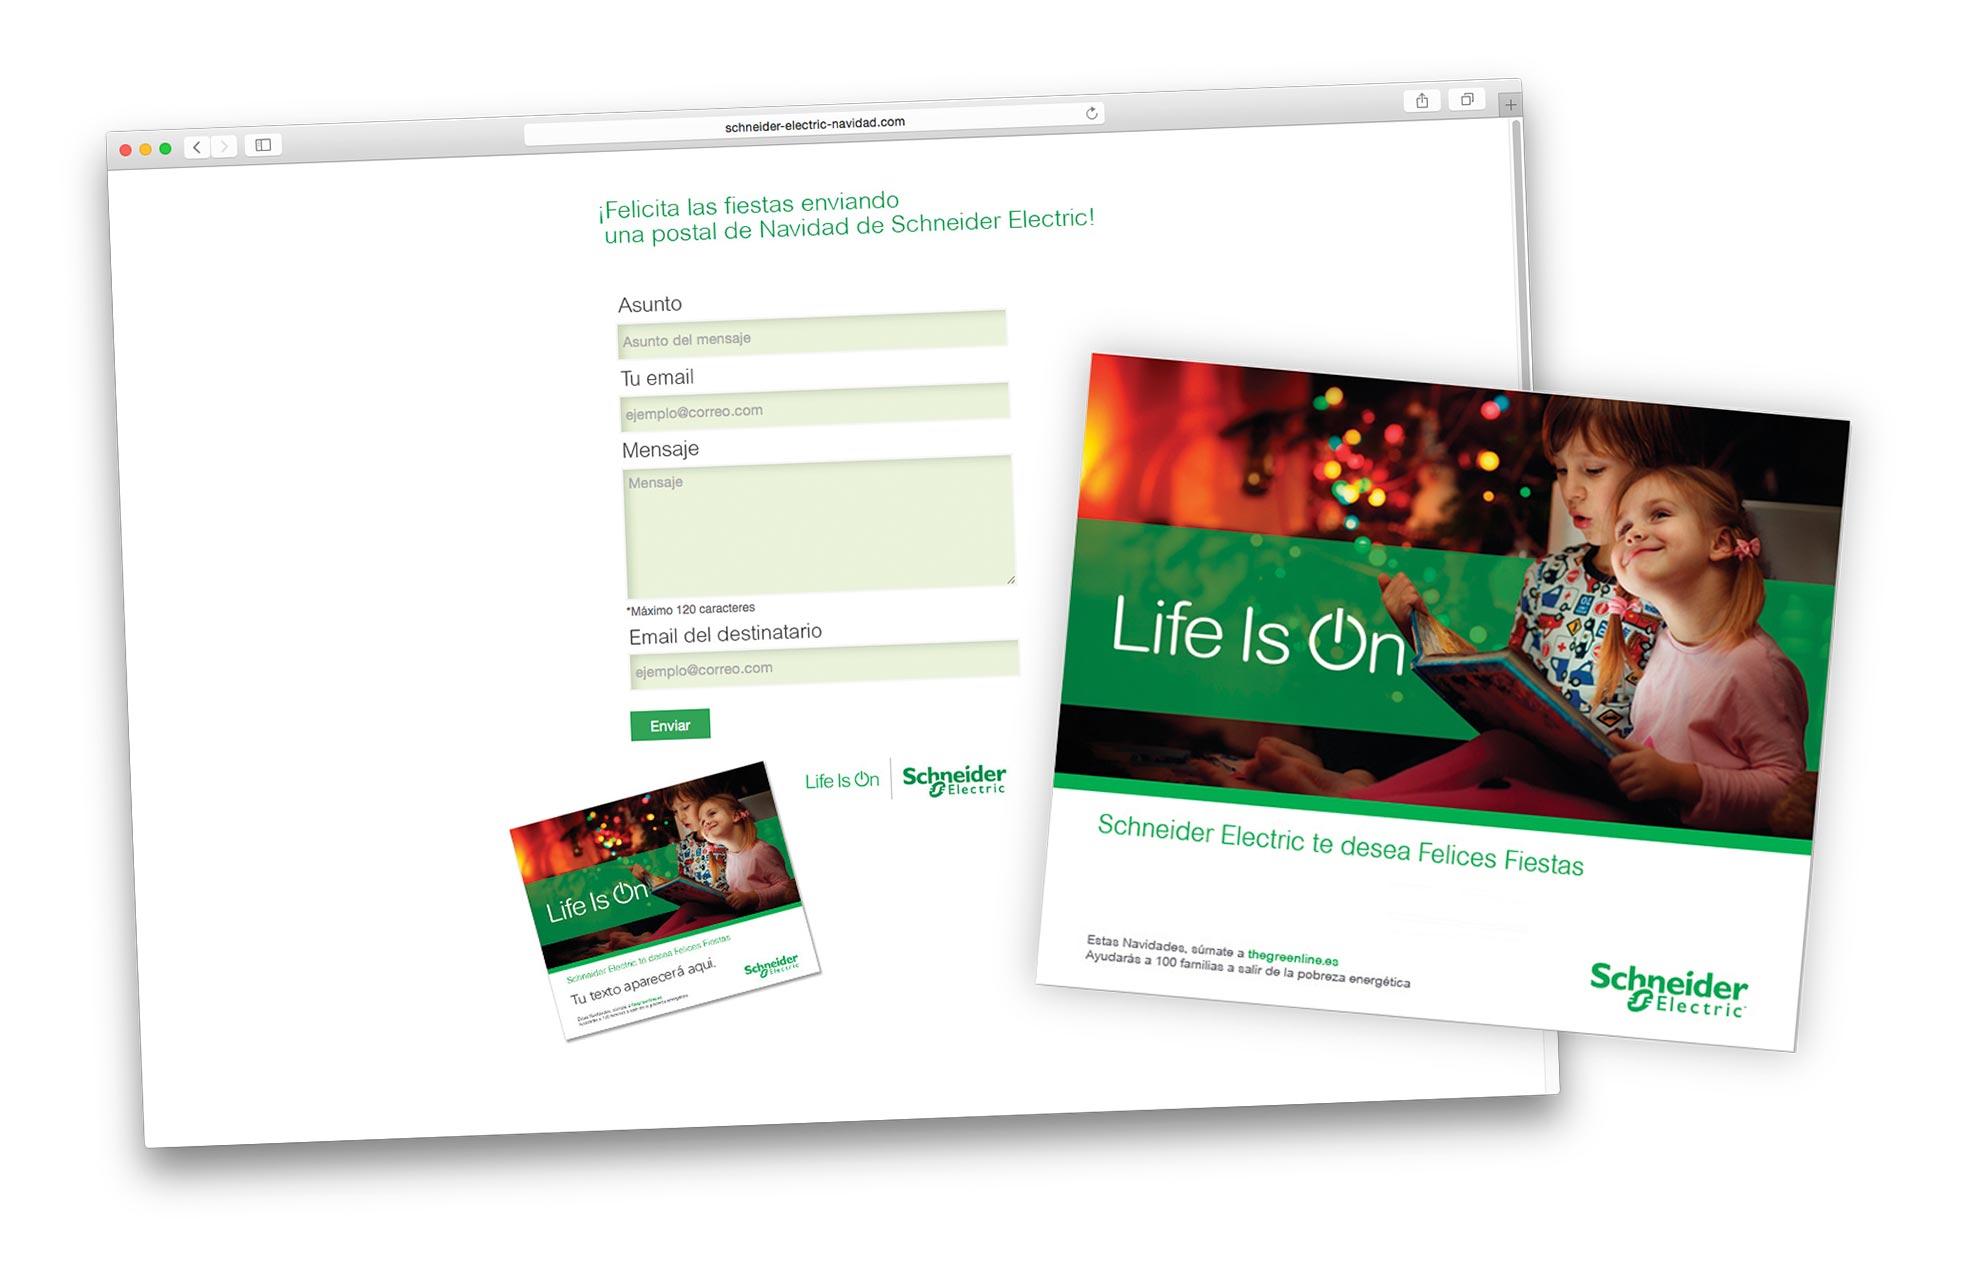 diseno minisite navidad - El marketing navideño en tu estrategia anual